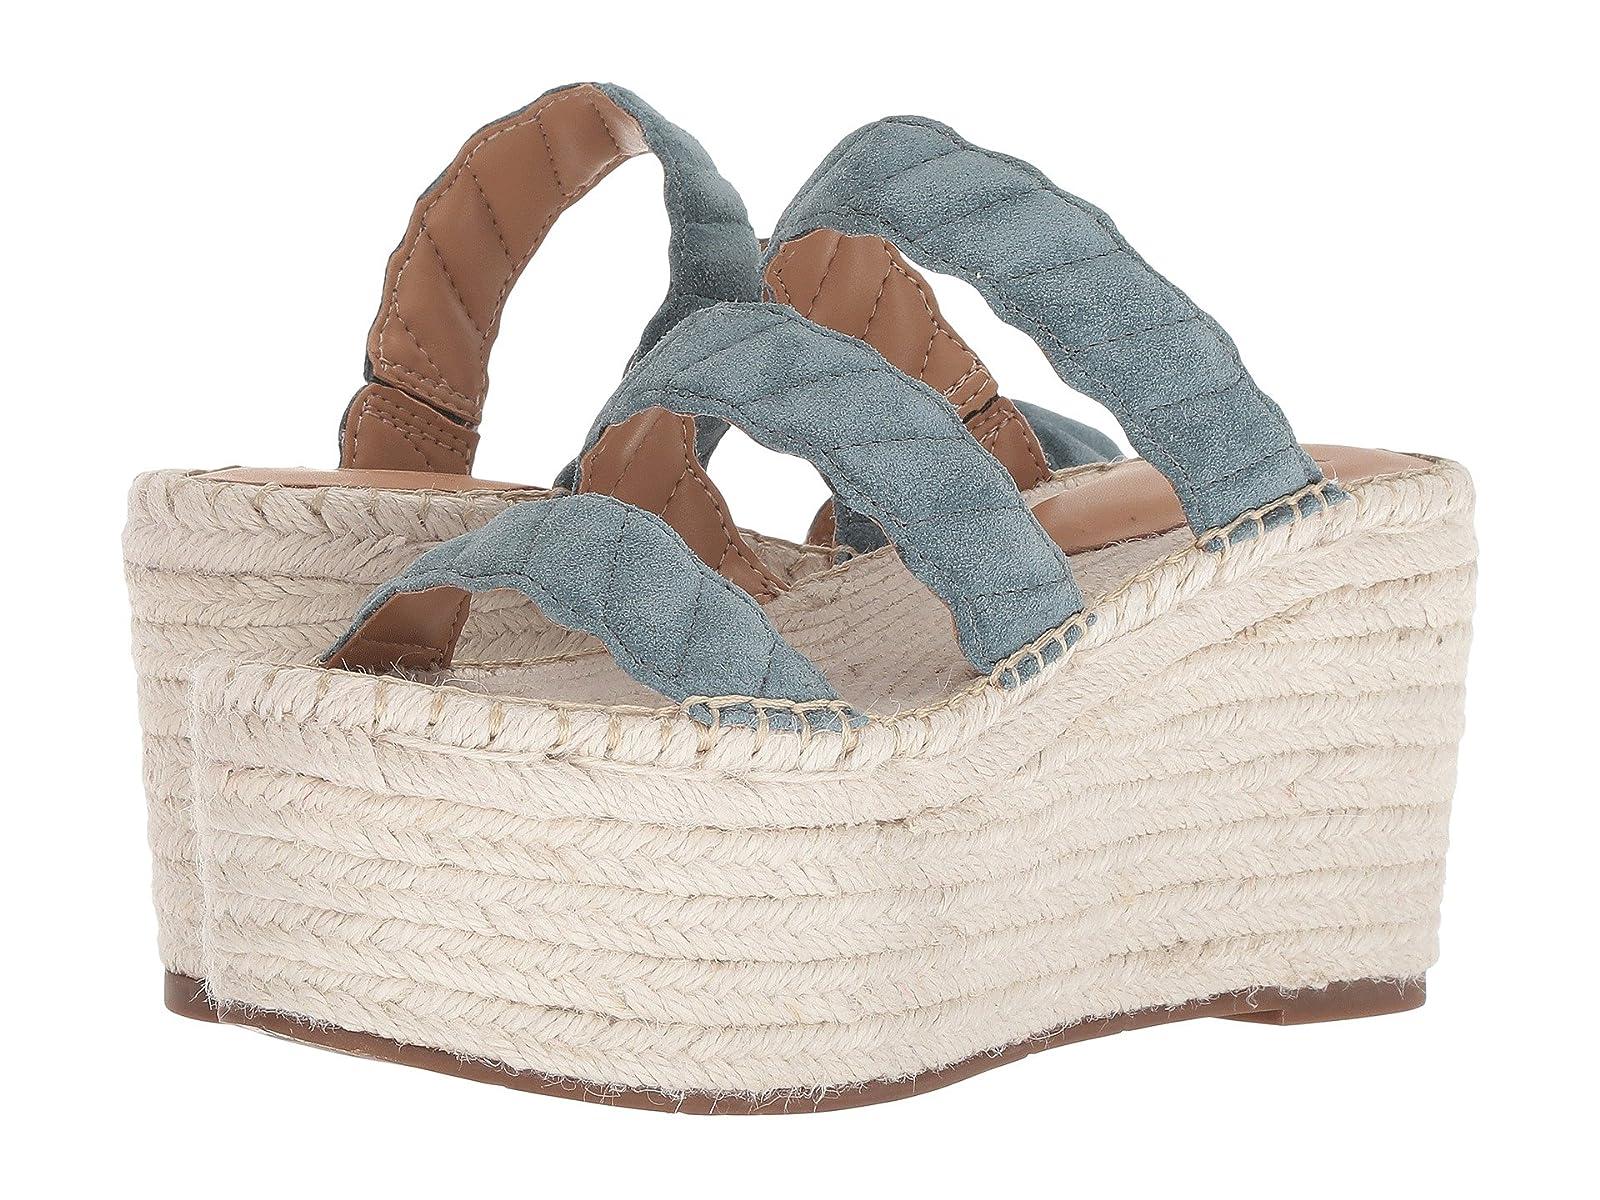 Marc Fisher LTD RosieAtmospheric grades have affordable shoes